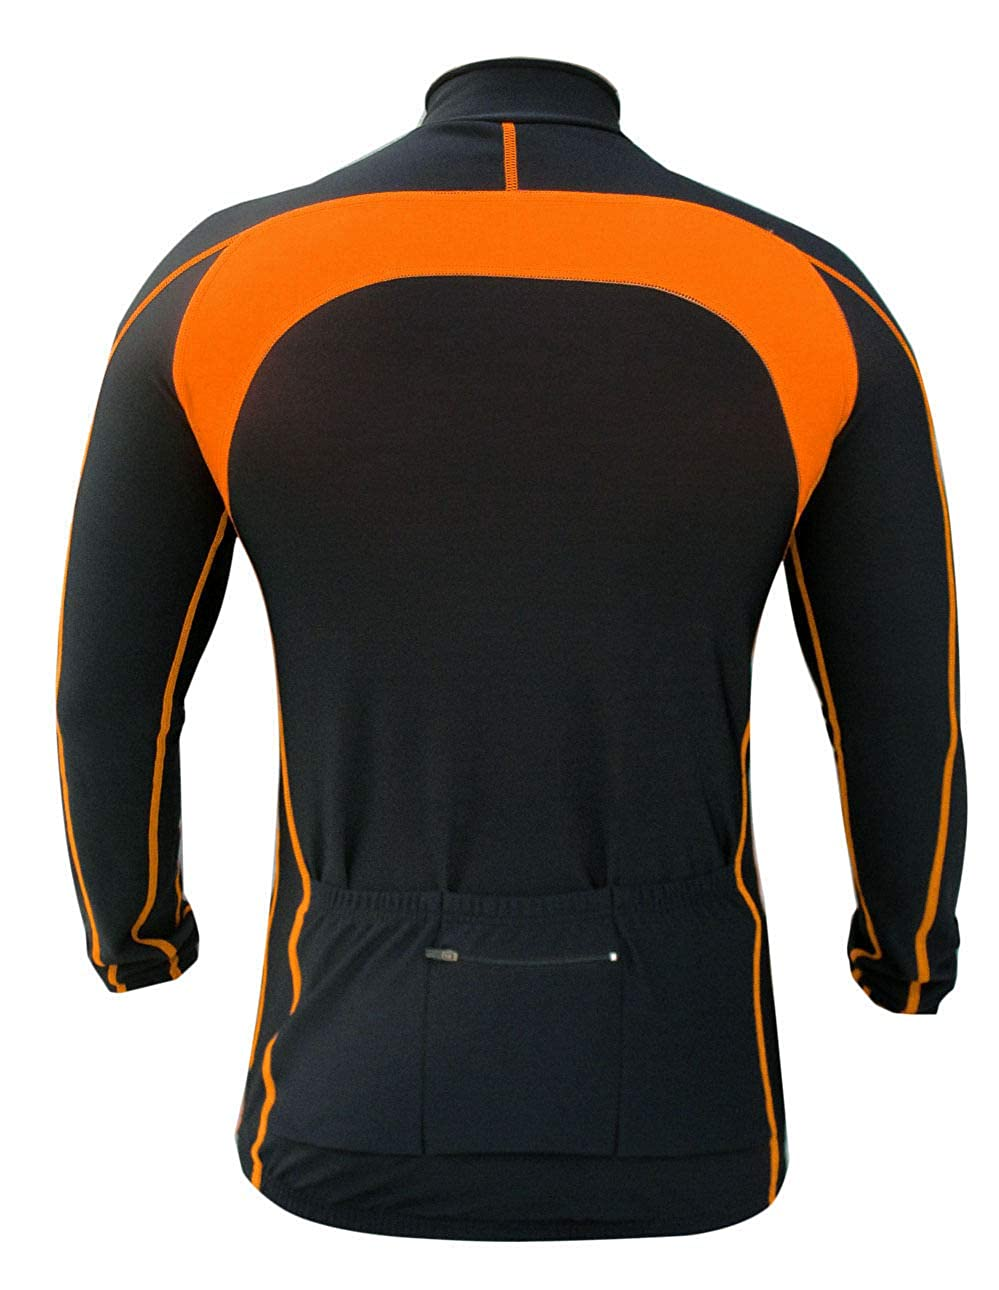 Winter Cycling Thermal Super Roubaix Fleece Jersey//Jacket Black//Orange 555